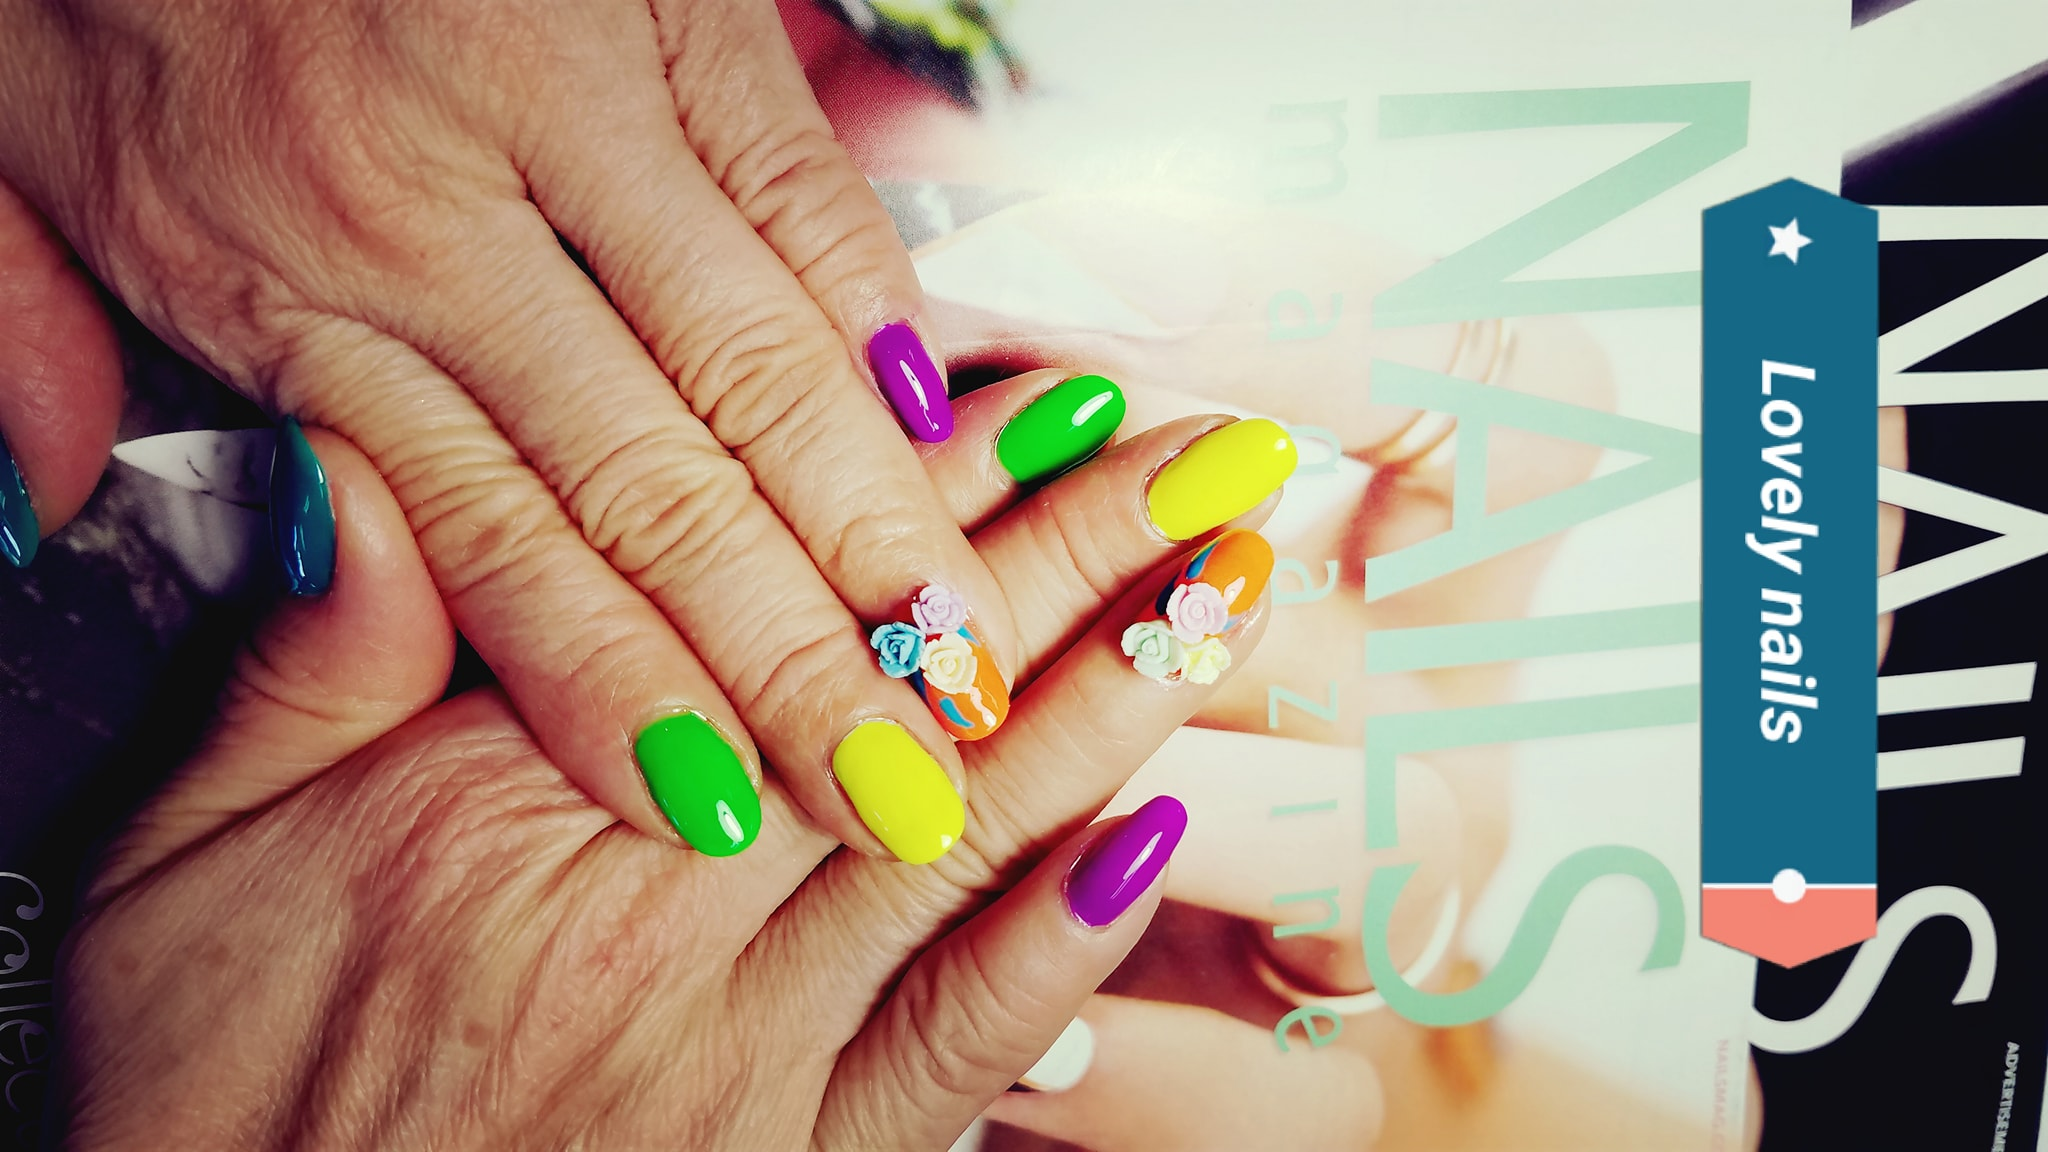 Lovely Nails 10909 Portland Ave E # N, Tacoma